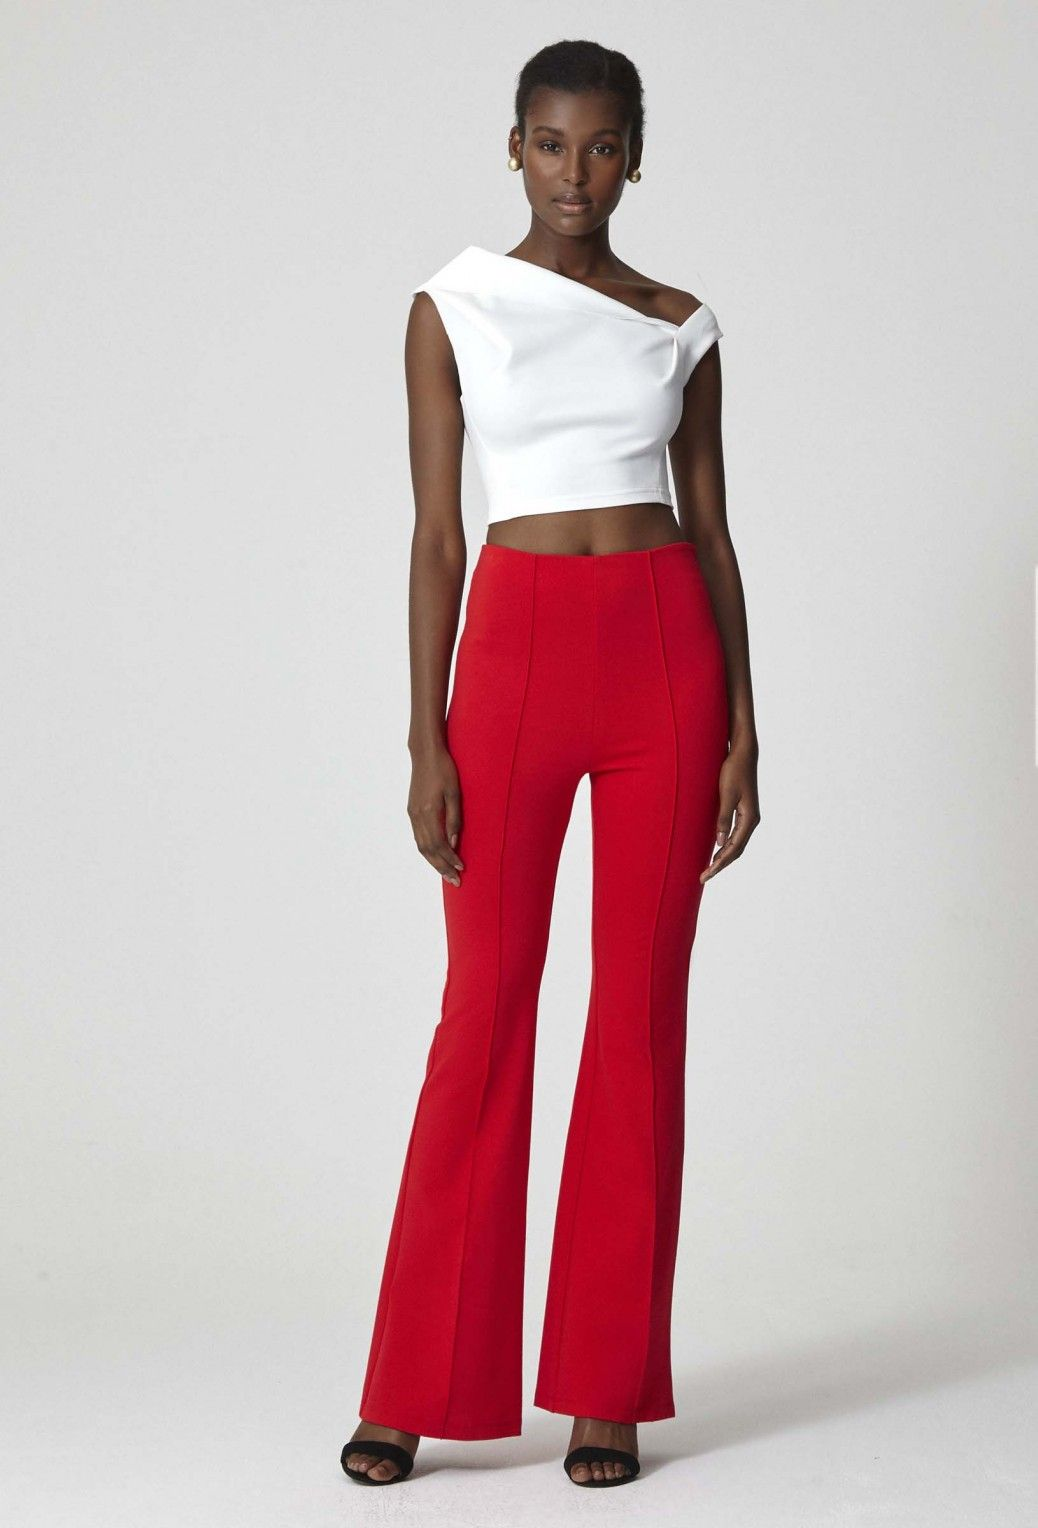 6e59a881aab8 Image 3 of AQ AQ Carter High Waist Trousers · Bright Red